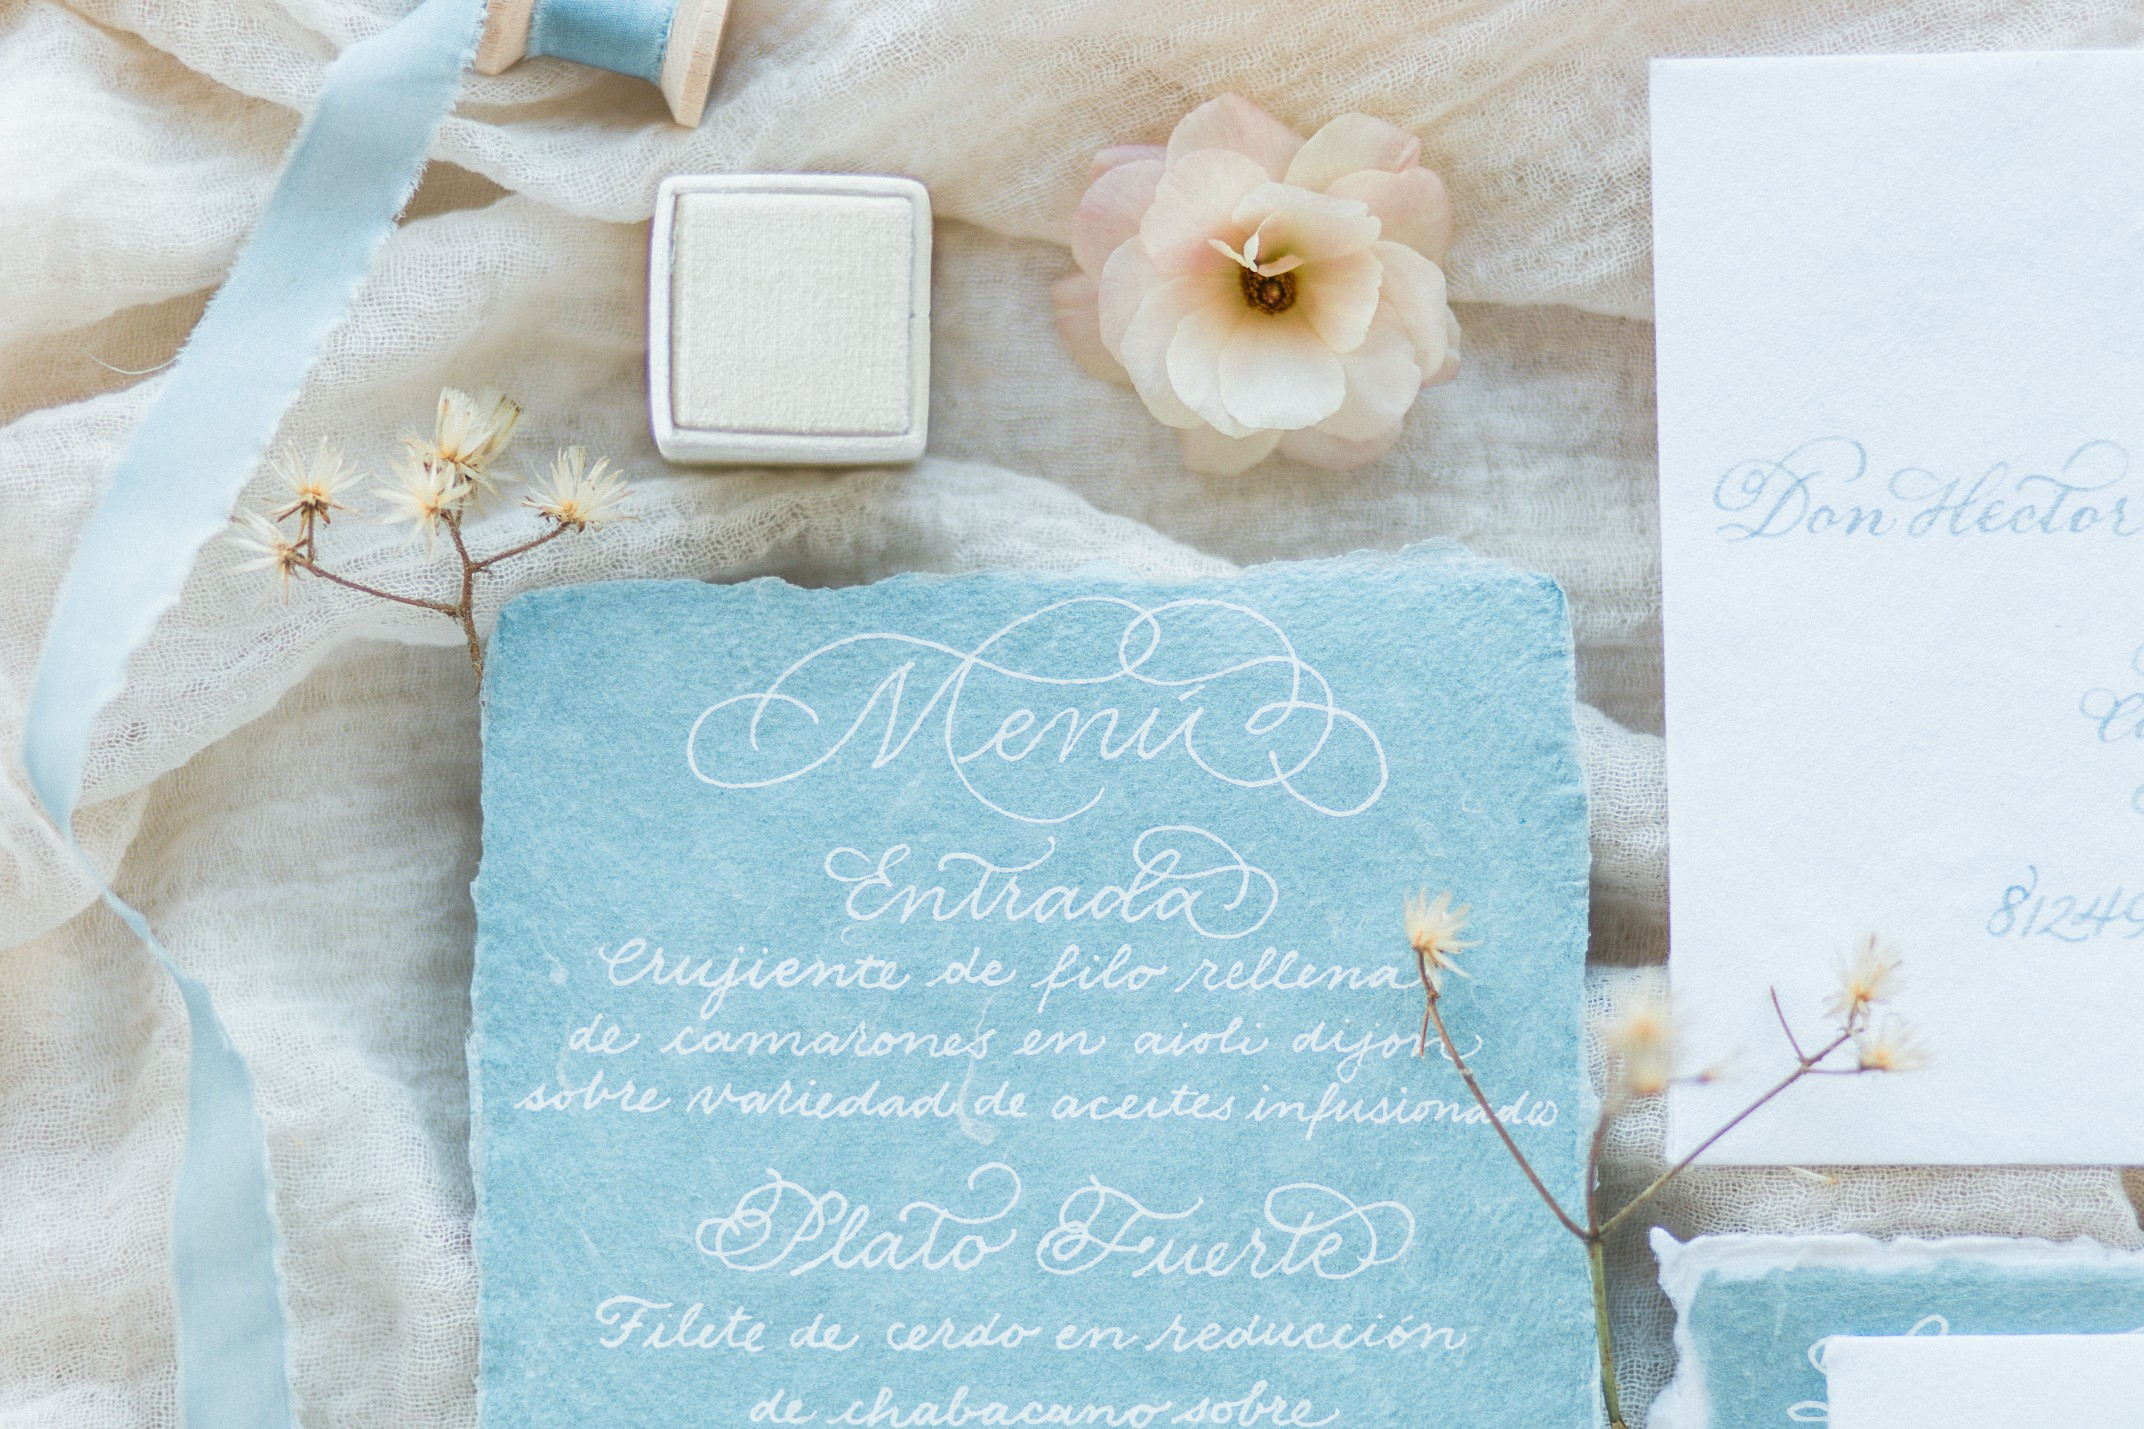 Los Cabos Wedding Photographer - Destination Wedding - Chileno Bay Resort Wedding Photos (16).jpg